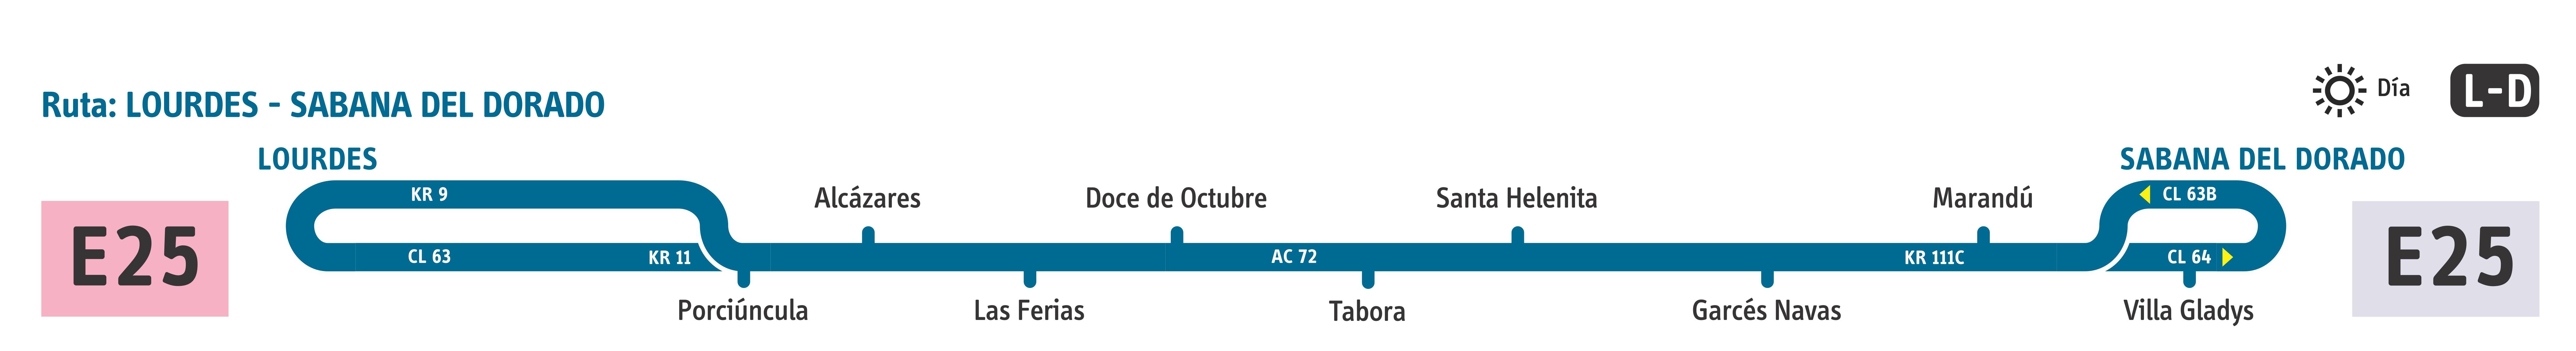 Diagrama ruta urbana Lourdes - Sabana del Dorado